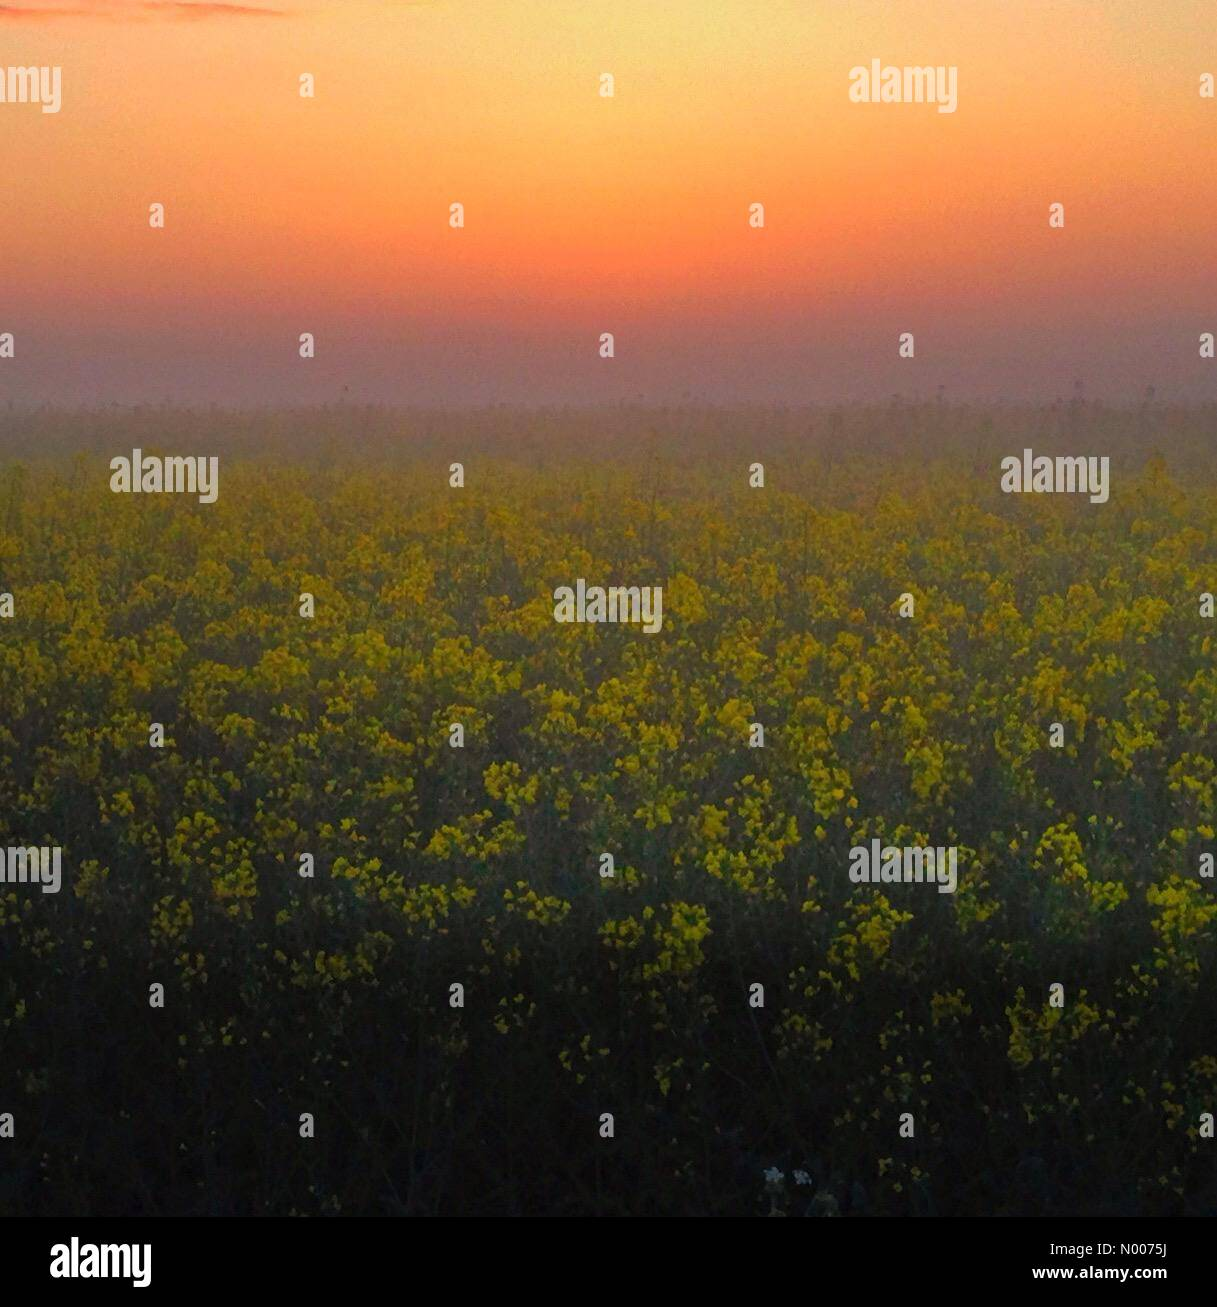 Wantage, Oxfordshire, UK. 17th May, 2016. UK Weather: Misty Rapeseed at dawn, Wantage, Oxon Credit:  nidpor/StockimoNews/Alamy - Stock Image